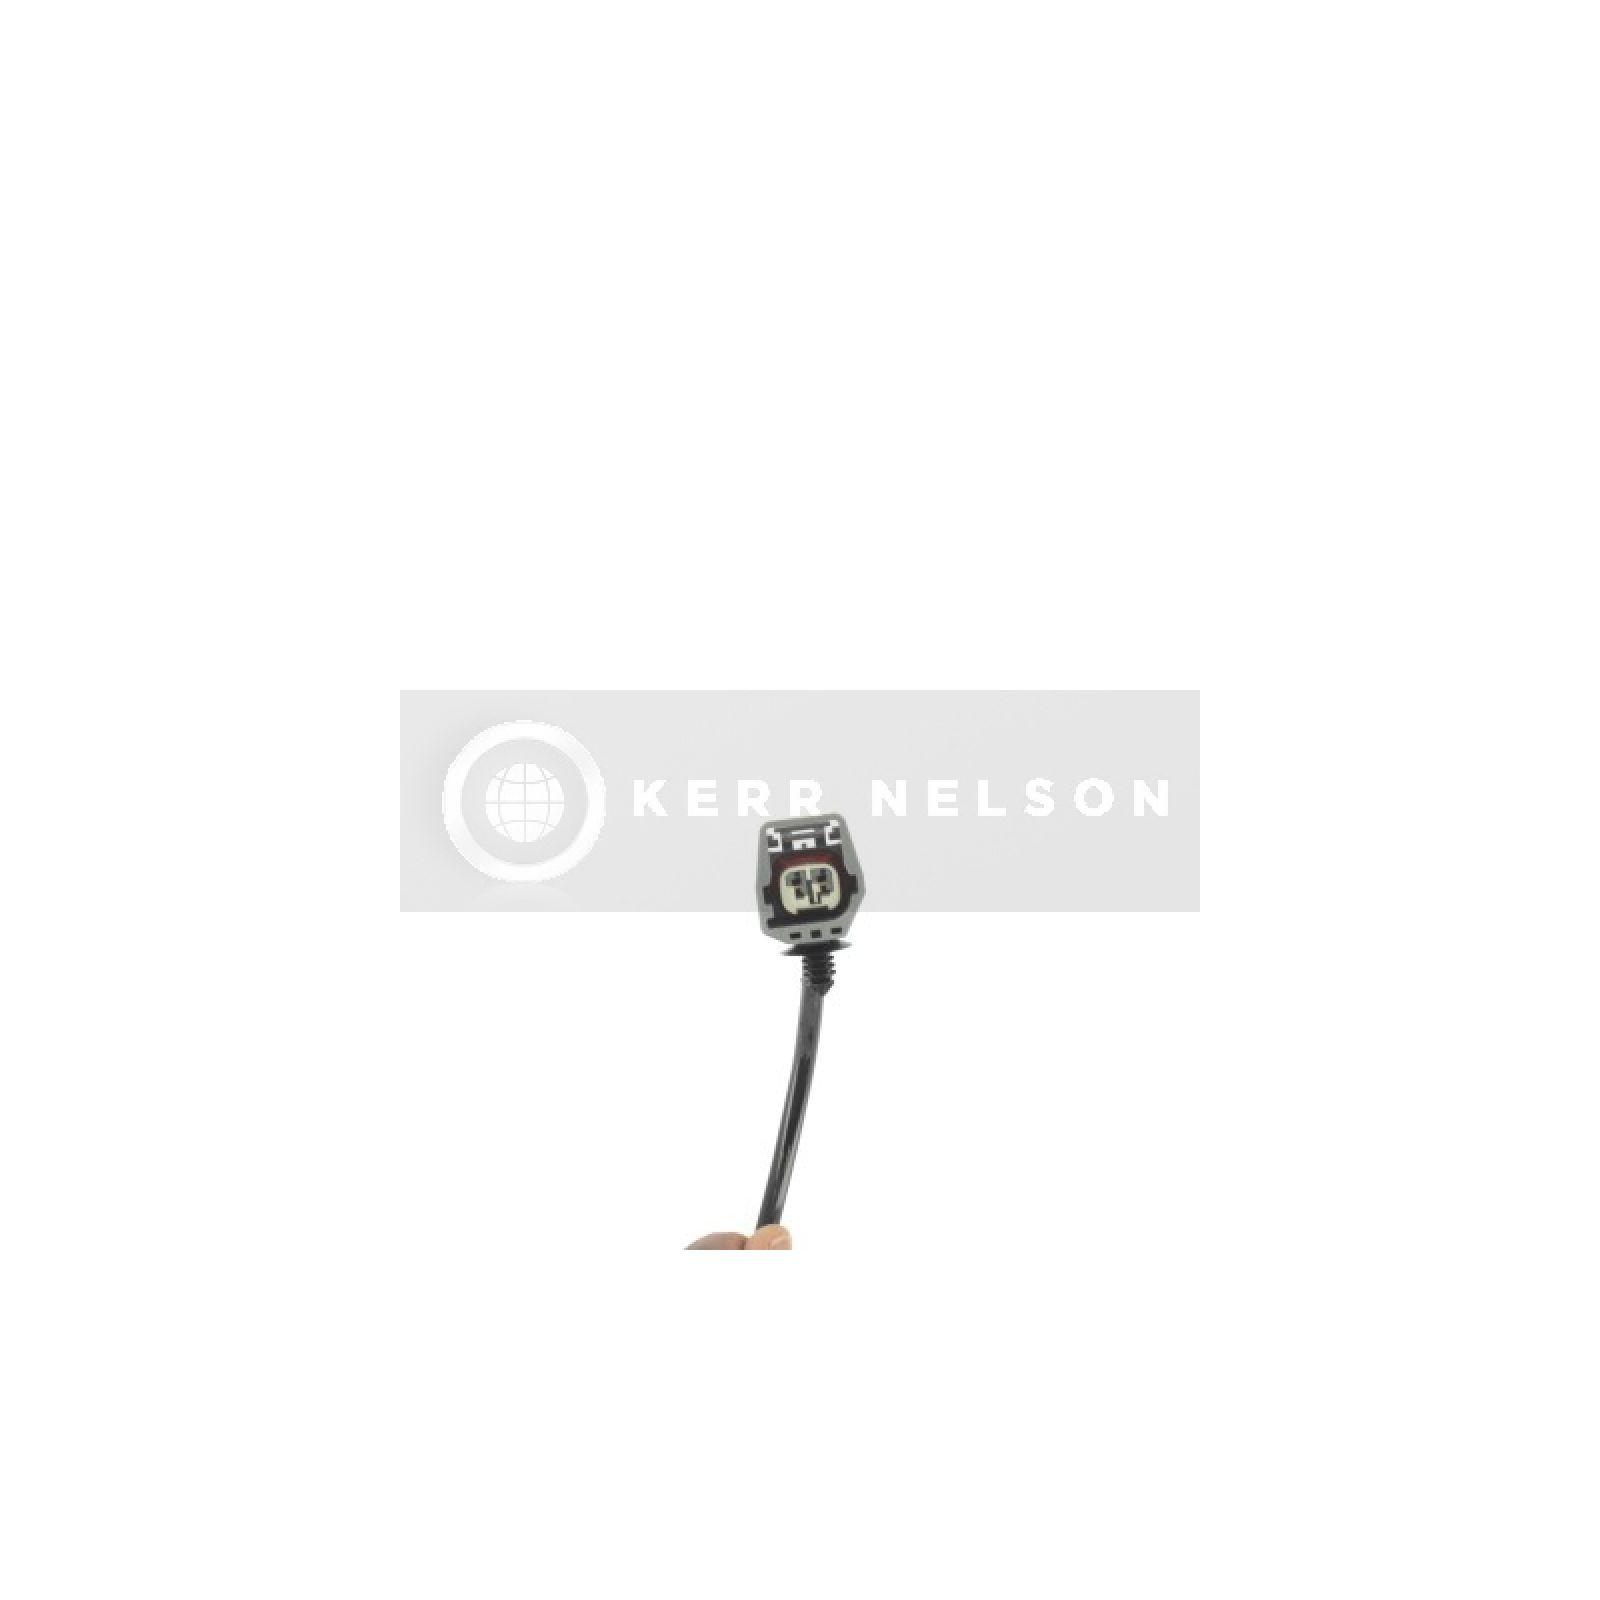 Ford-Focus-MK3-2-0-St-Genuino-Kerr-Nelson-Sensor-de-detonacion miniatura 2